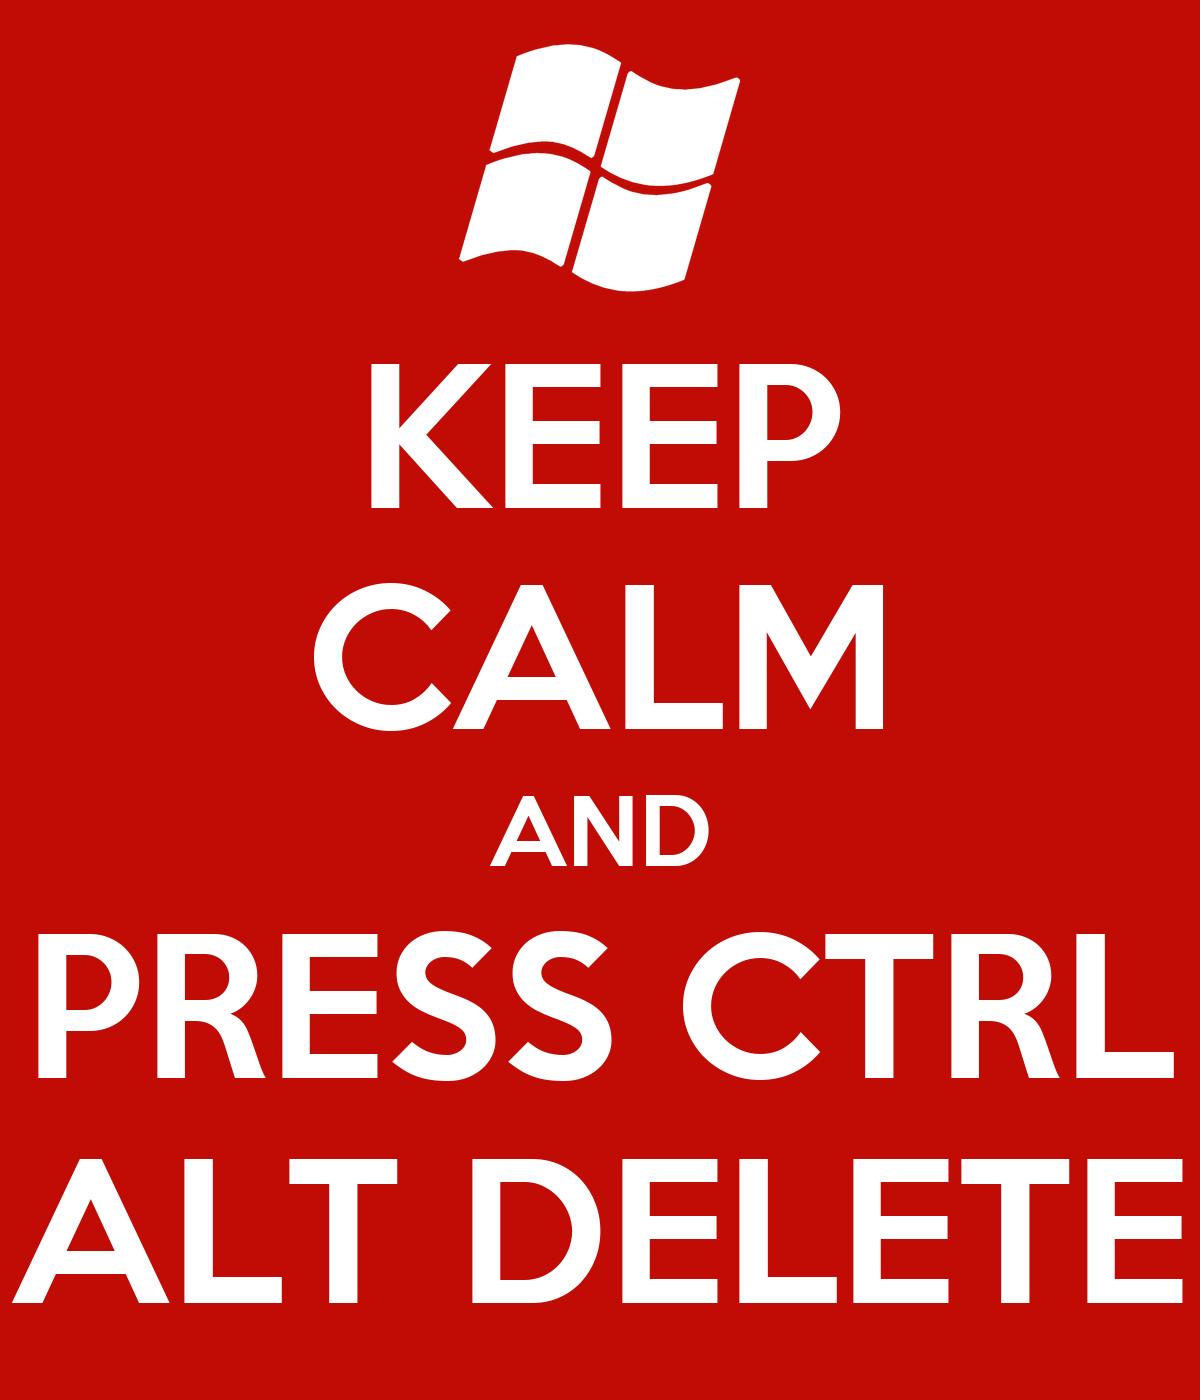 how to press ctrl alt delete in virtualbox